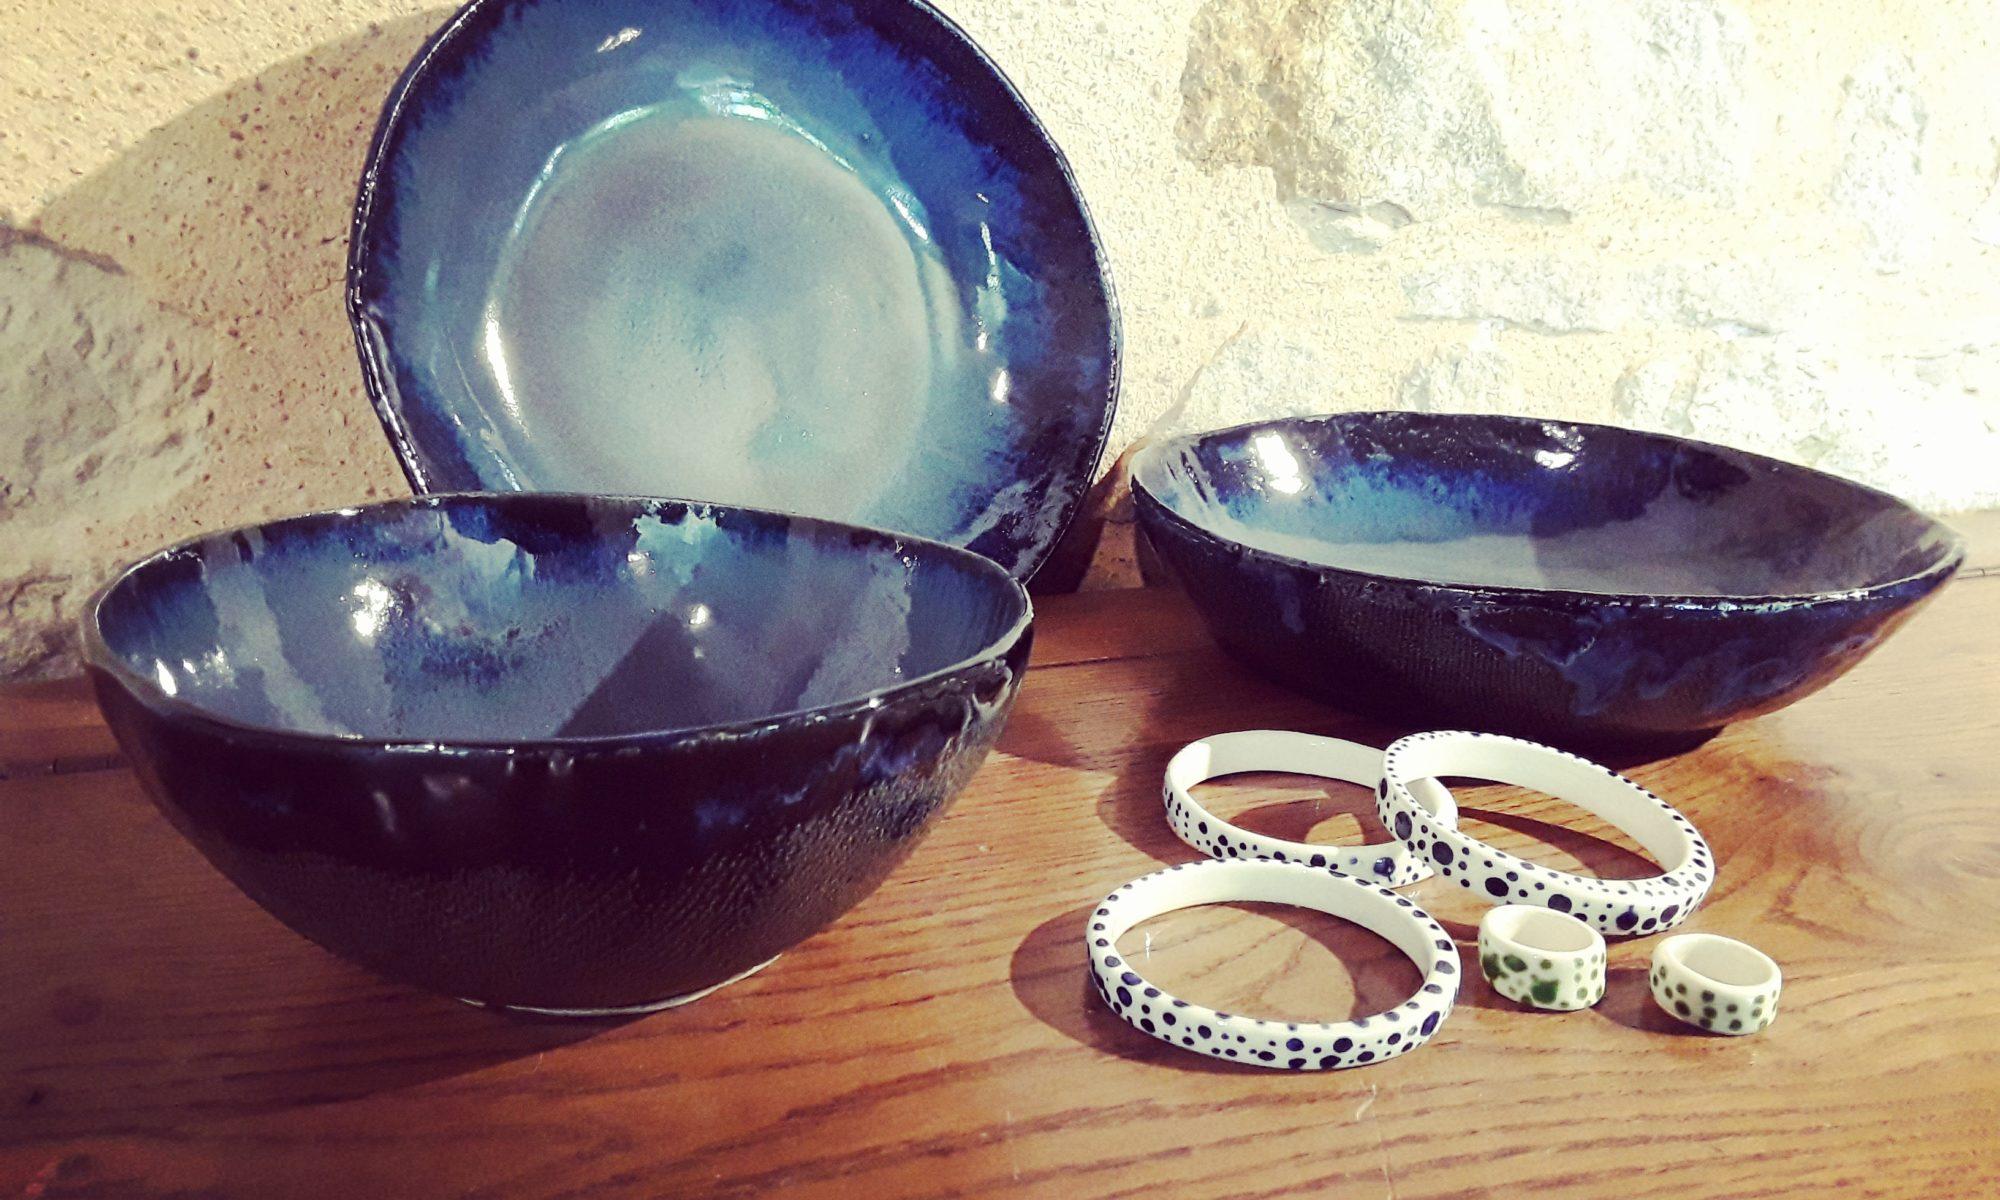 Ceramique made in france